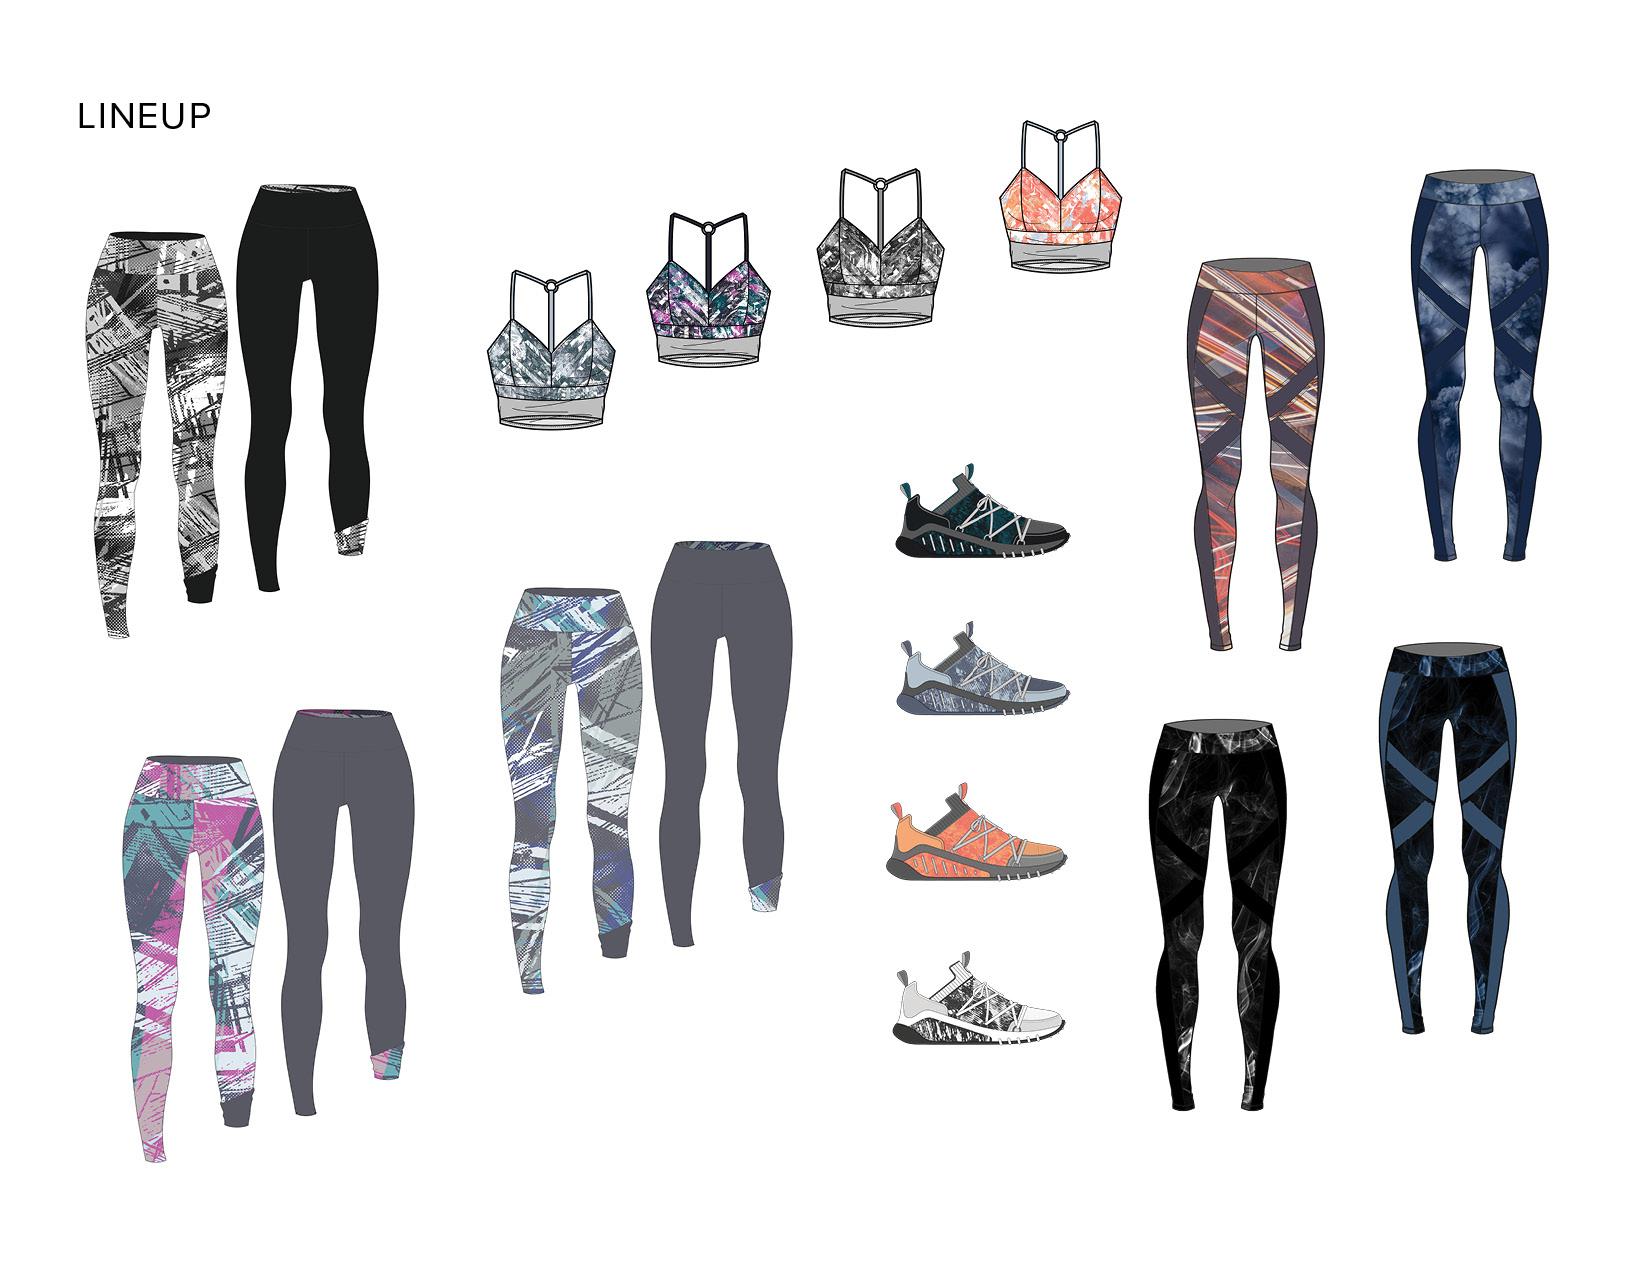 adidas_5_website27.jpg